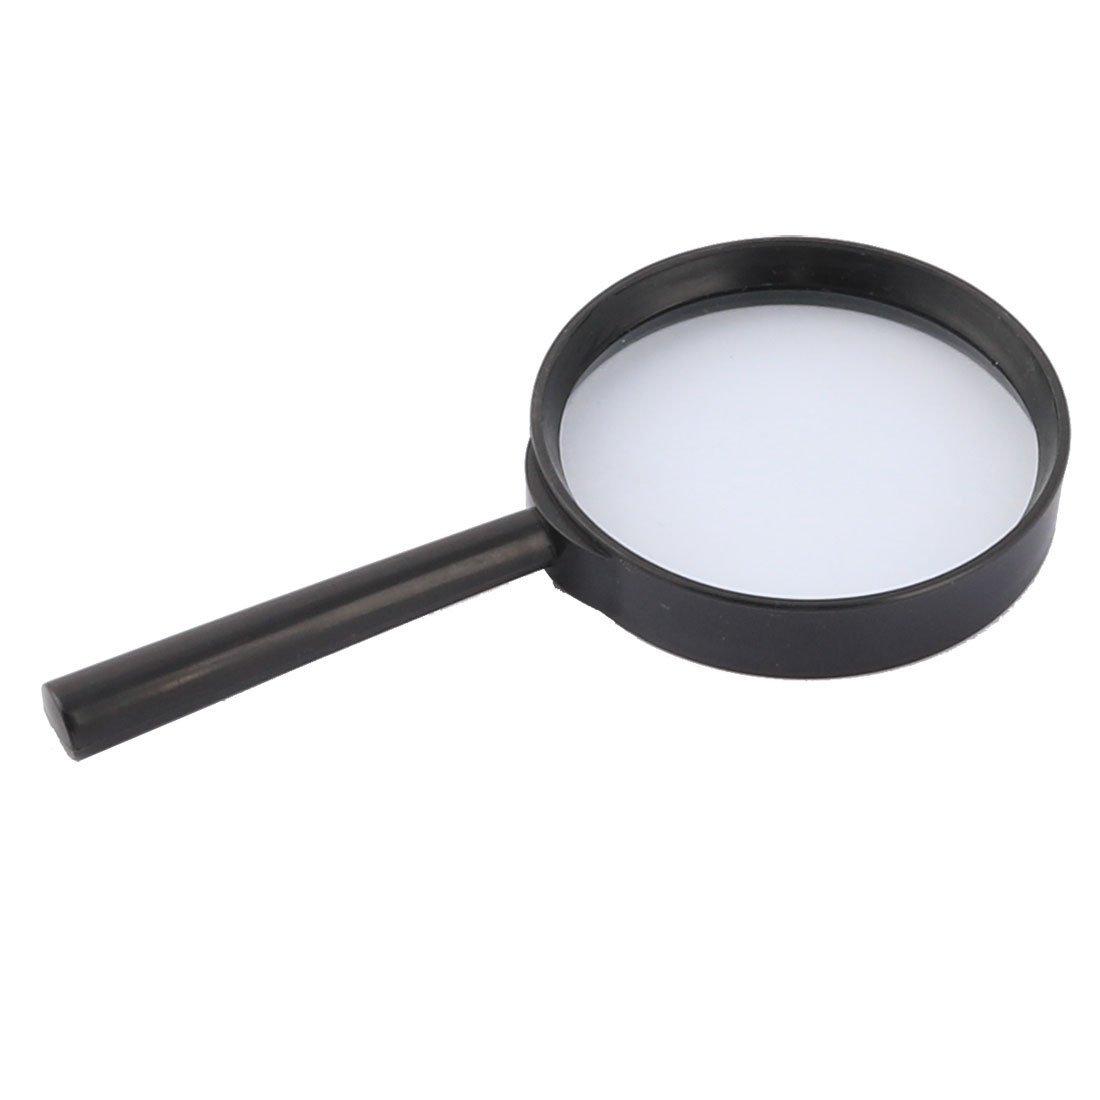 Amazon.com: eDealMax Mango de plástico DE 70 mm de diámetro de lente óptico 5X portátil Lupa Negro Claro: Health & Personal Care